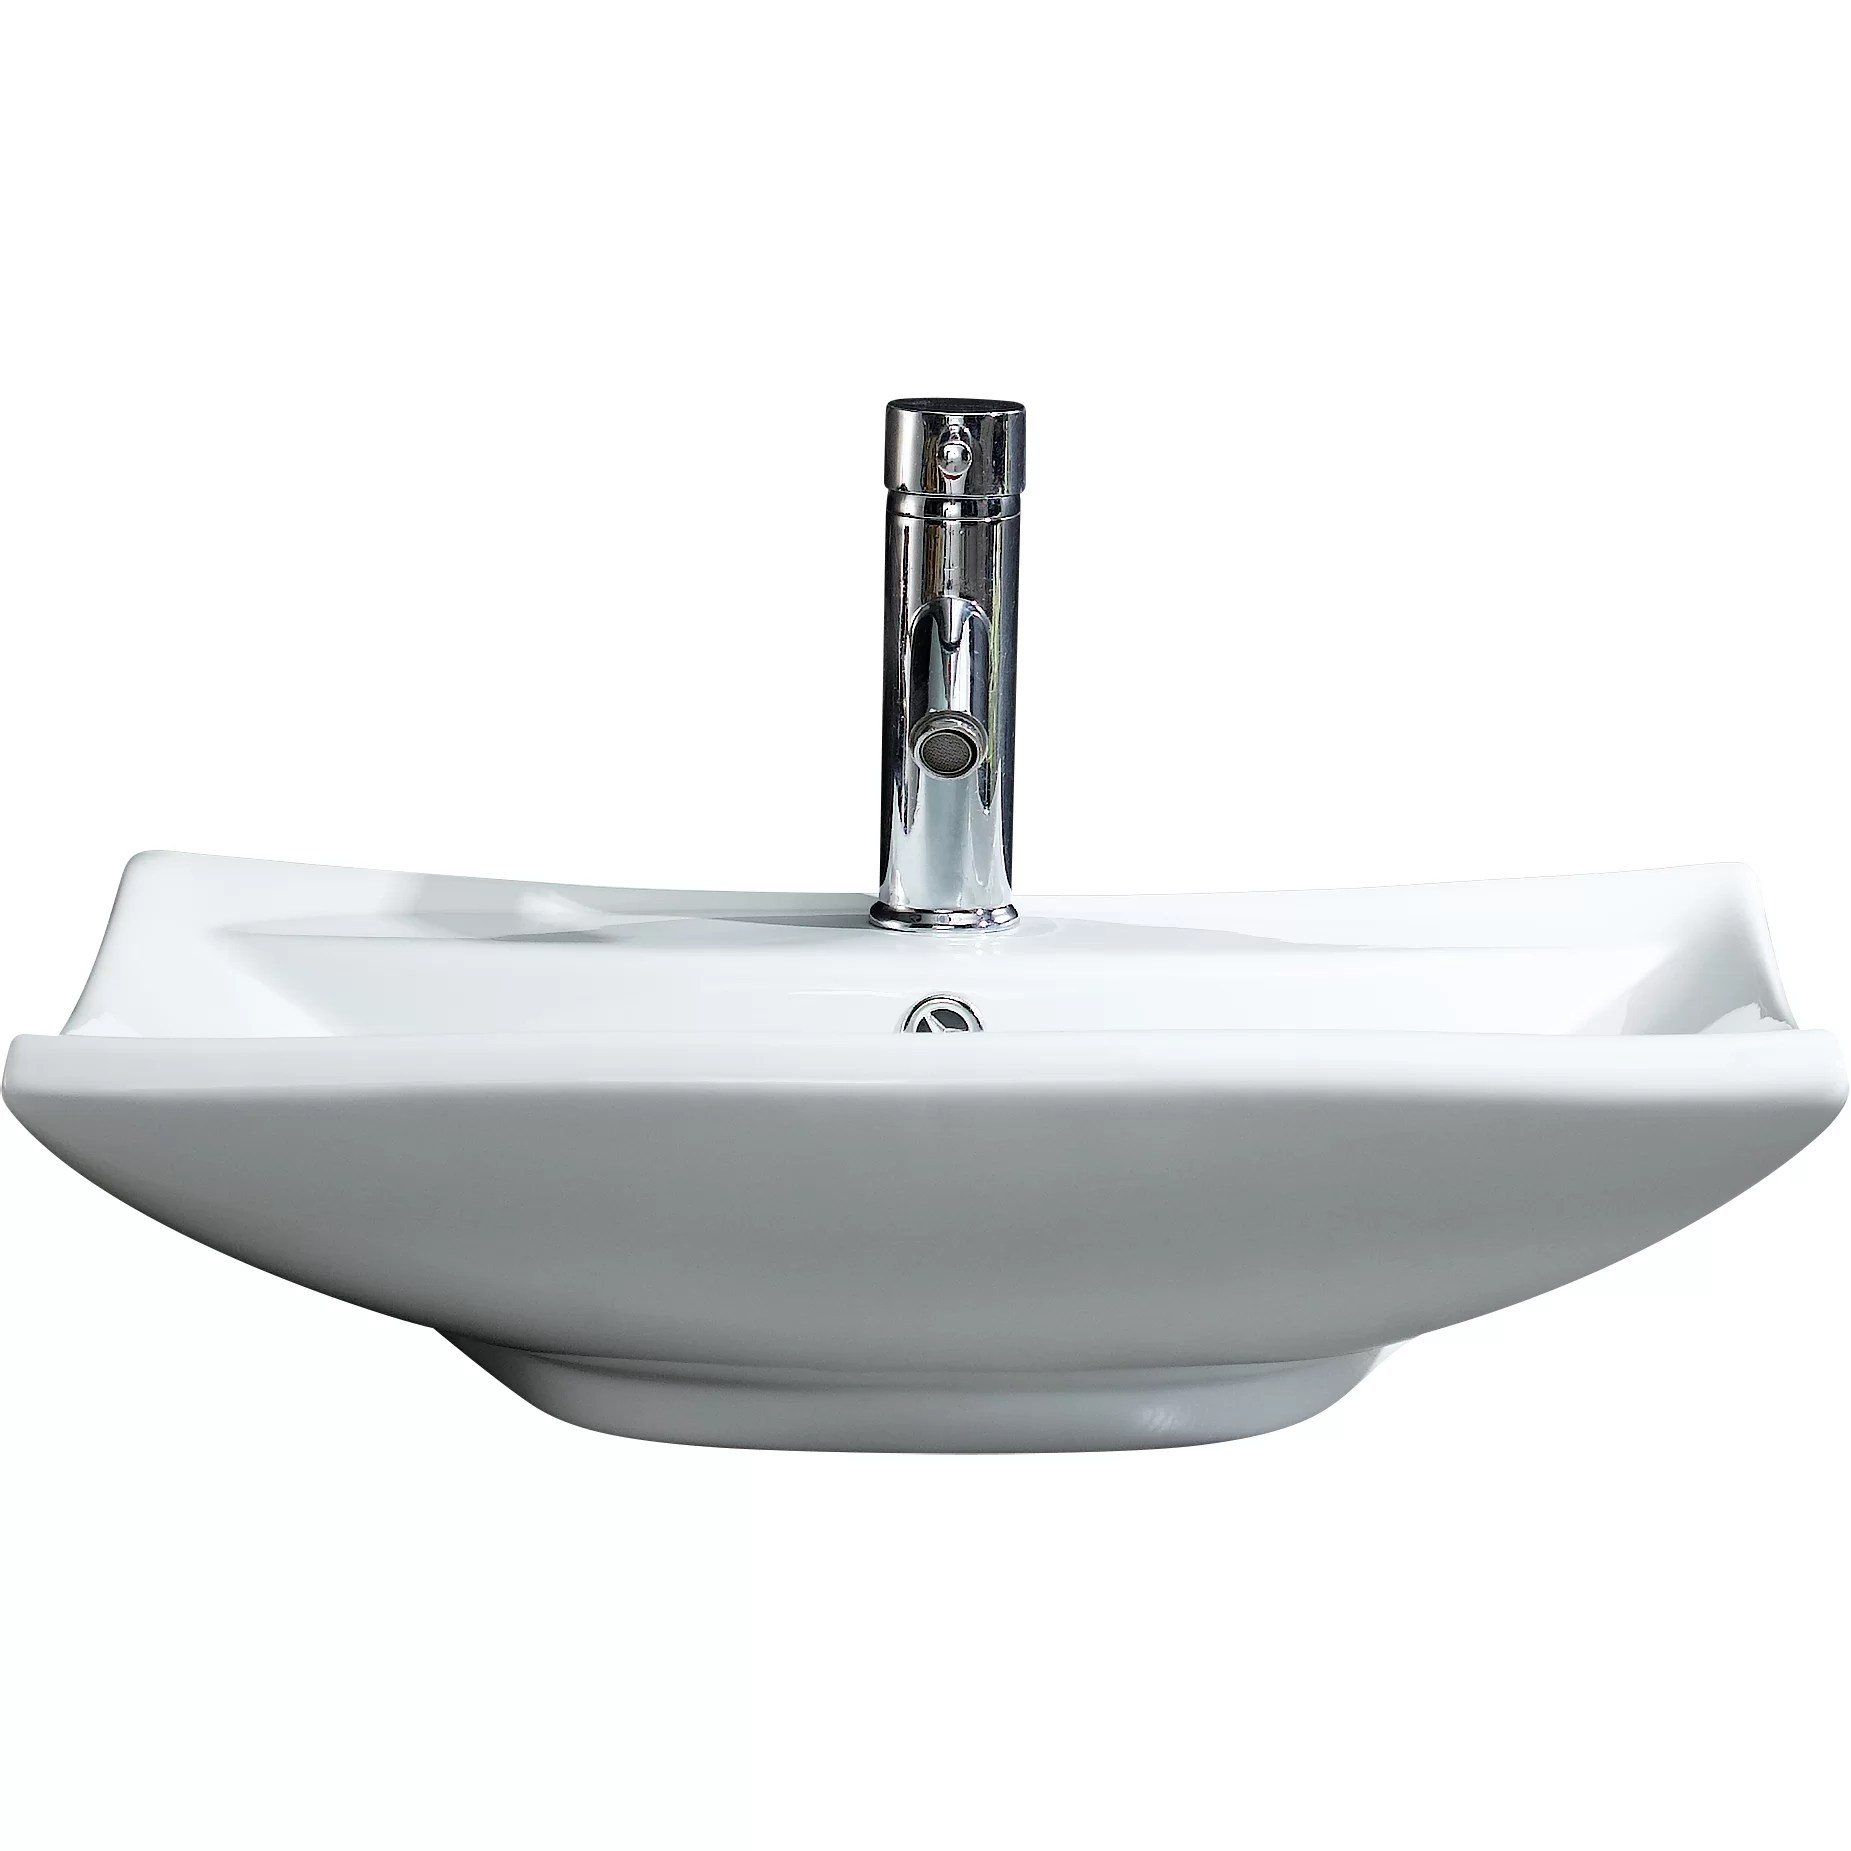 Fine Fixtures Modern Vitreous Square Vessel Sink Vessel